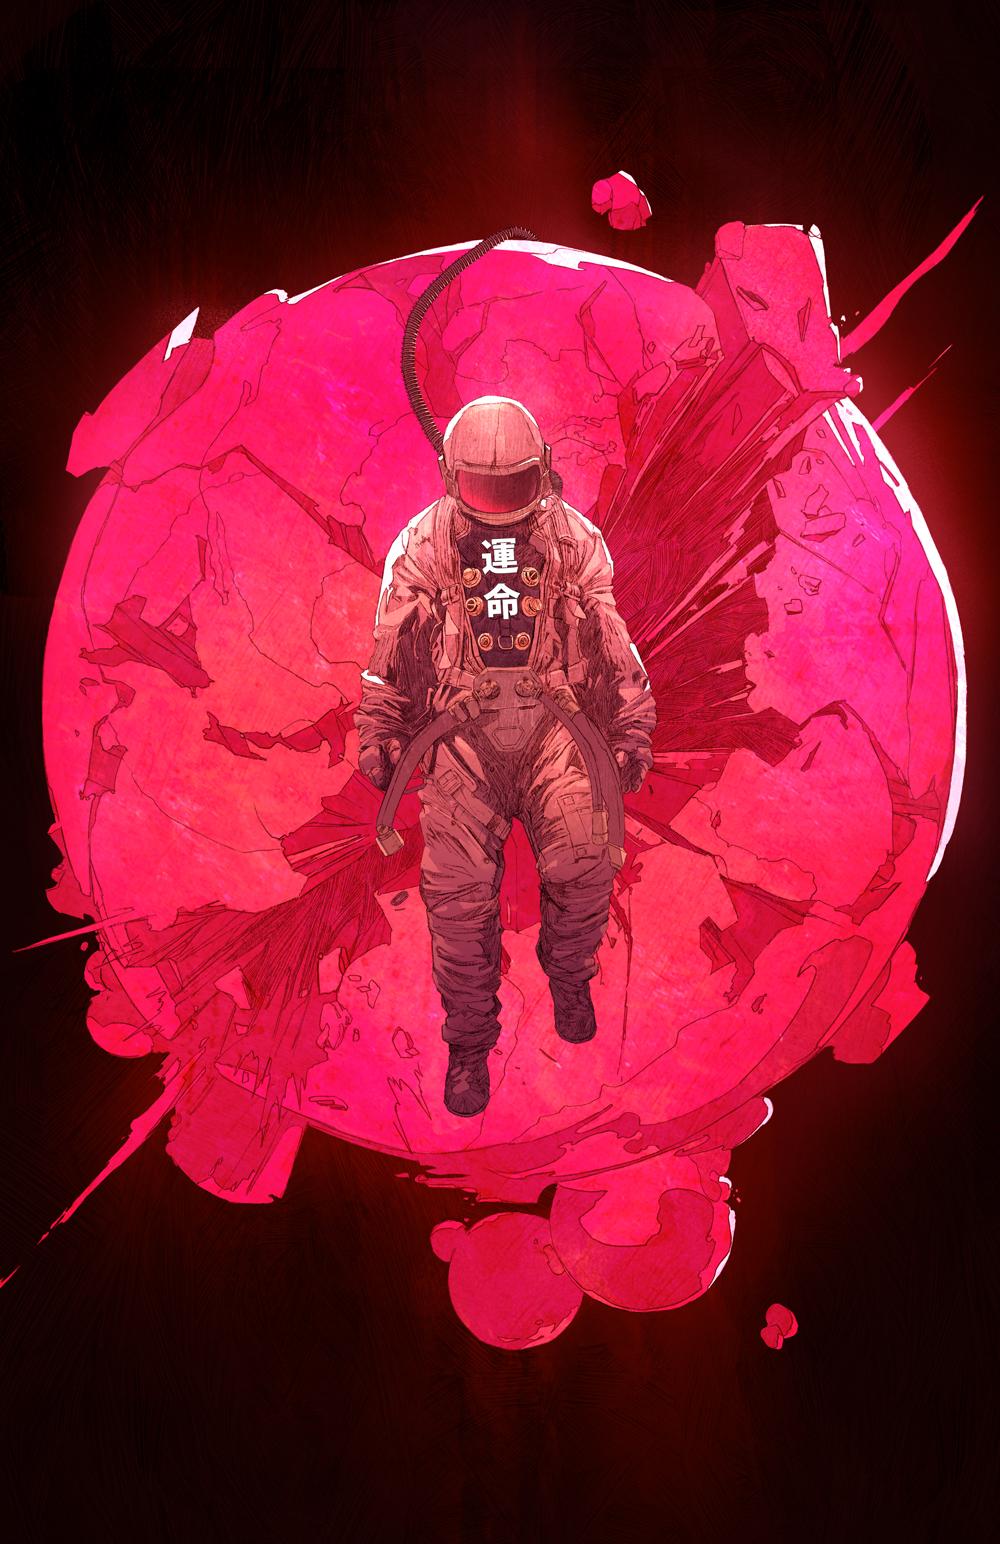 Astronaut aesthetic